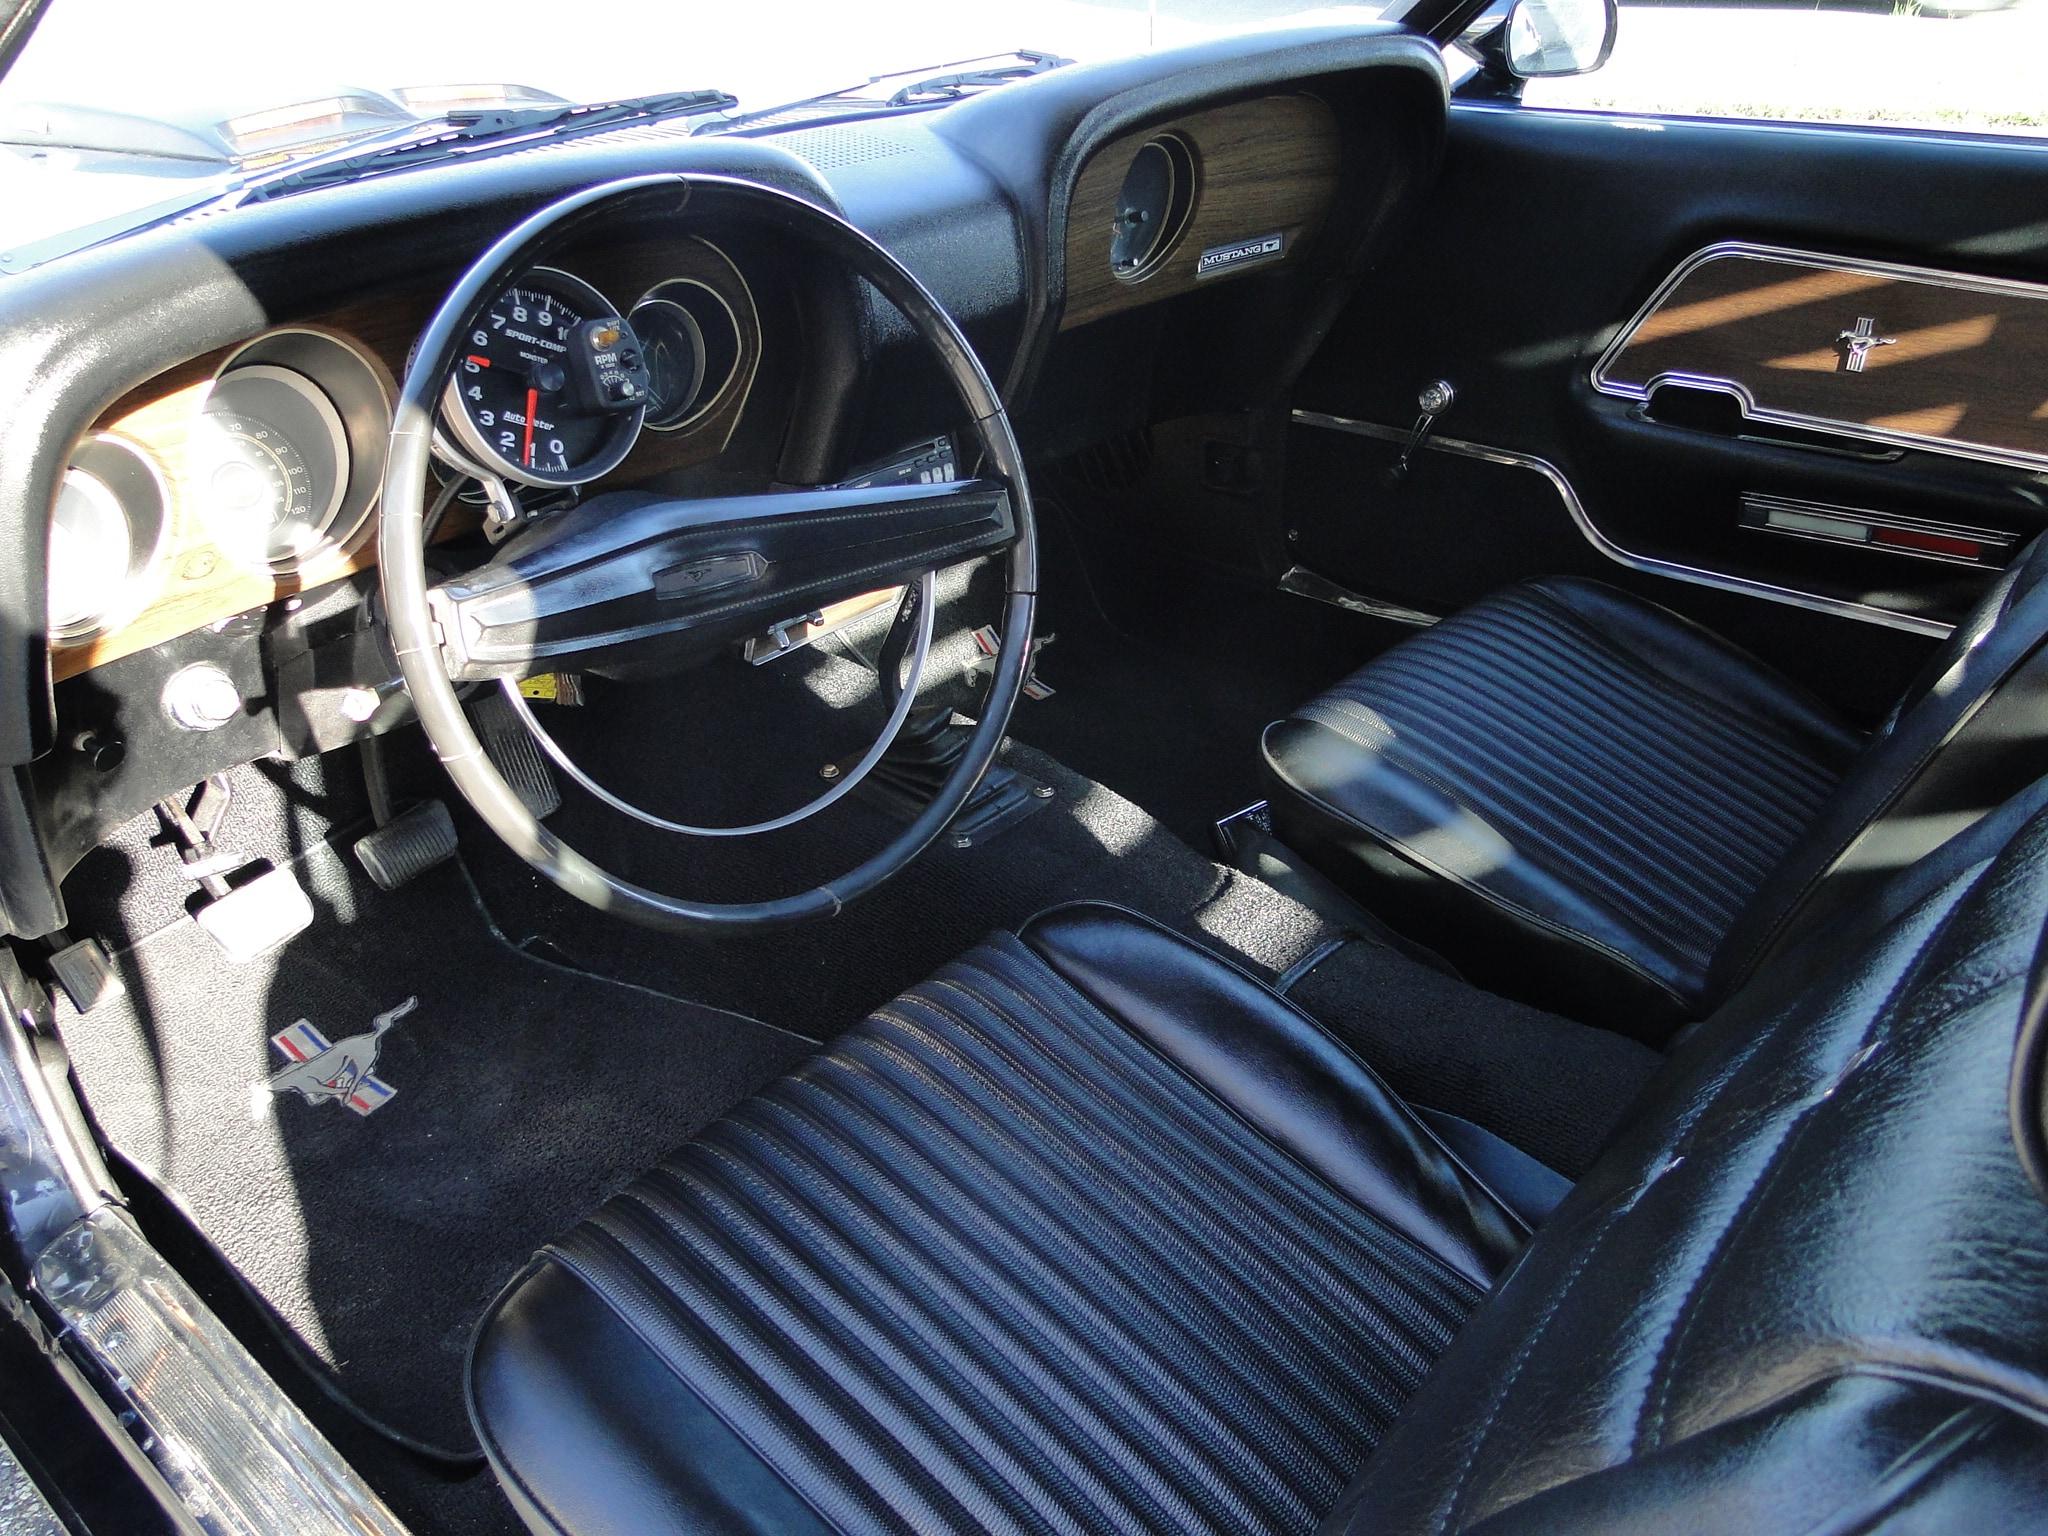 fastback glen burnie md 1969 ford mustang fastback sold fastback glen burnie md - 1969 Ford Mustang Fastback Interior